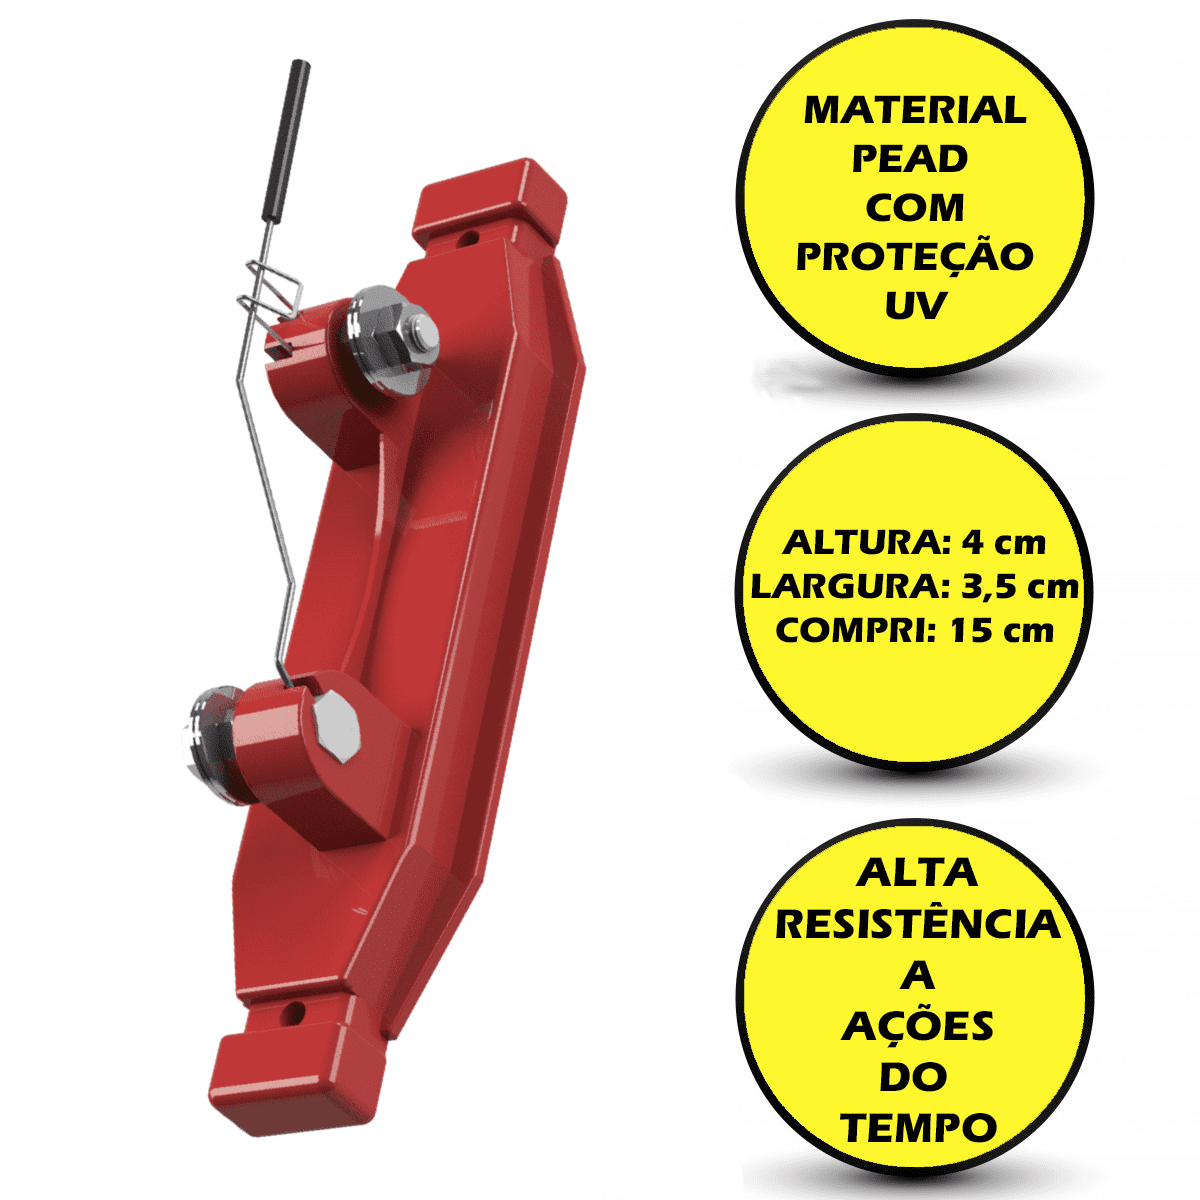 1 Chave Conexão Isolador Interruptor Interruptora Para Cerca Elétrica  - Ambientude Agro e Pet